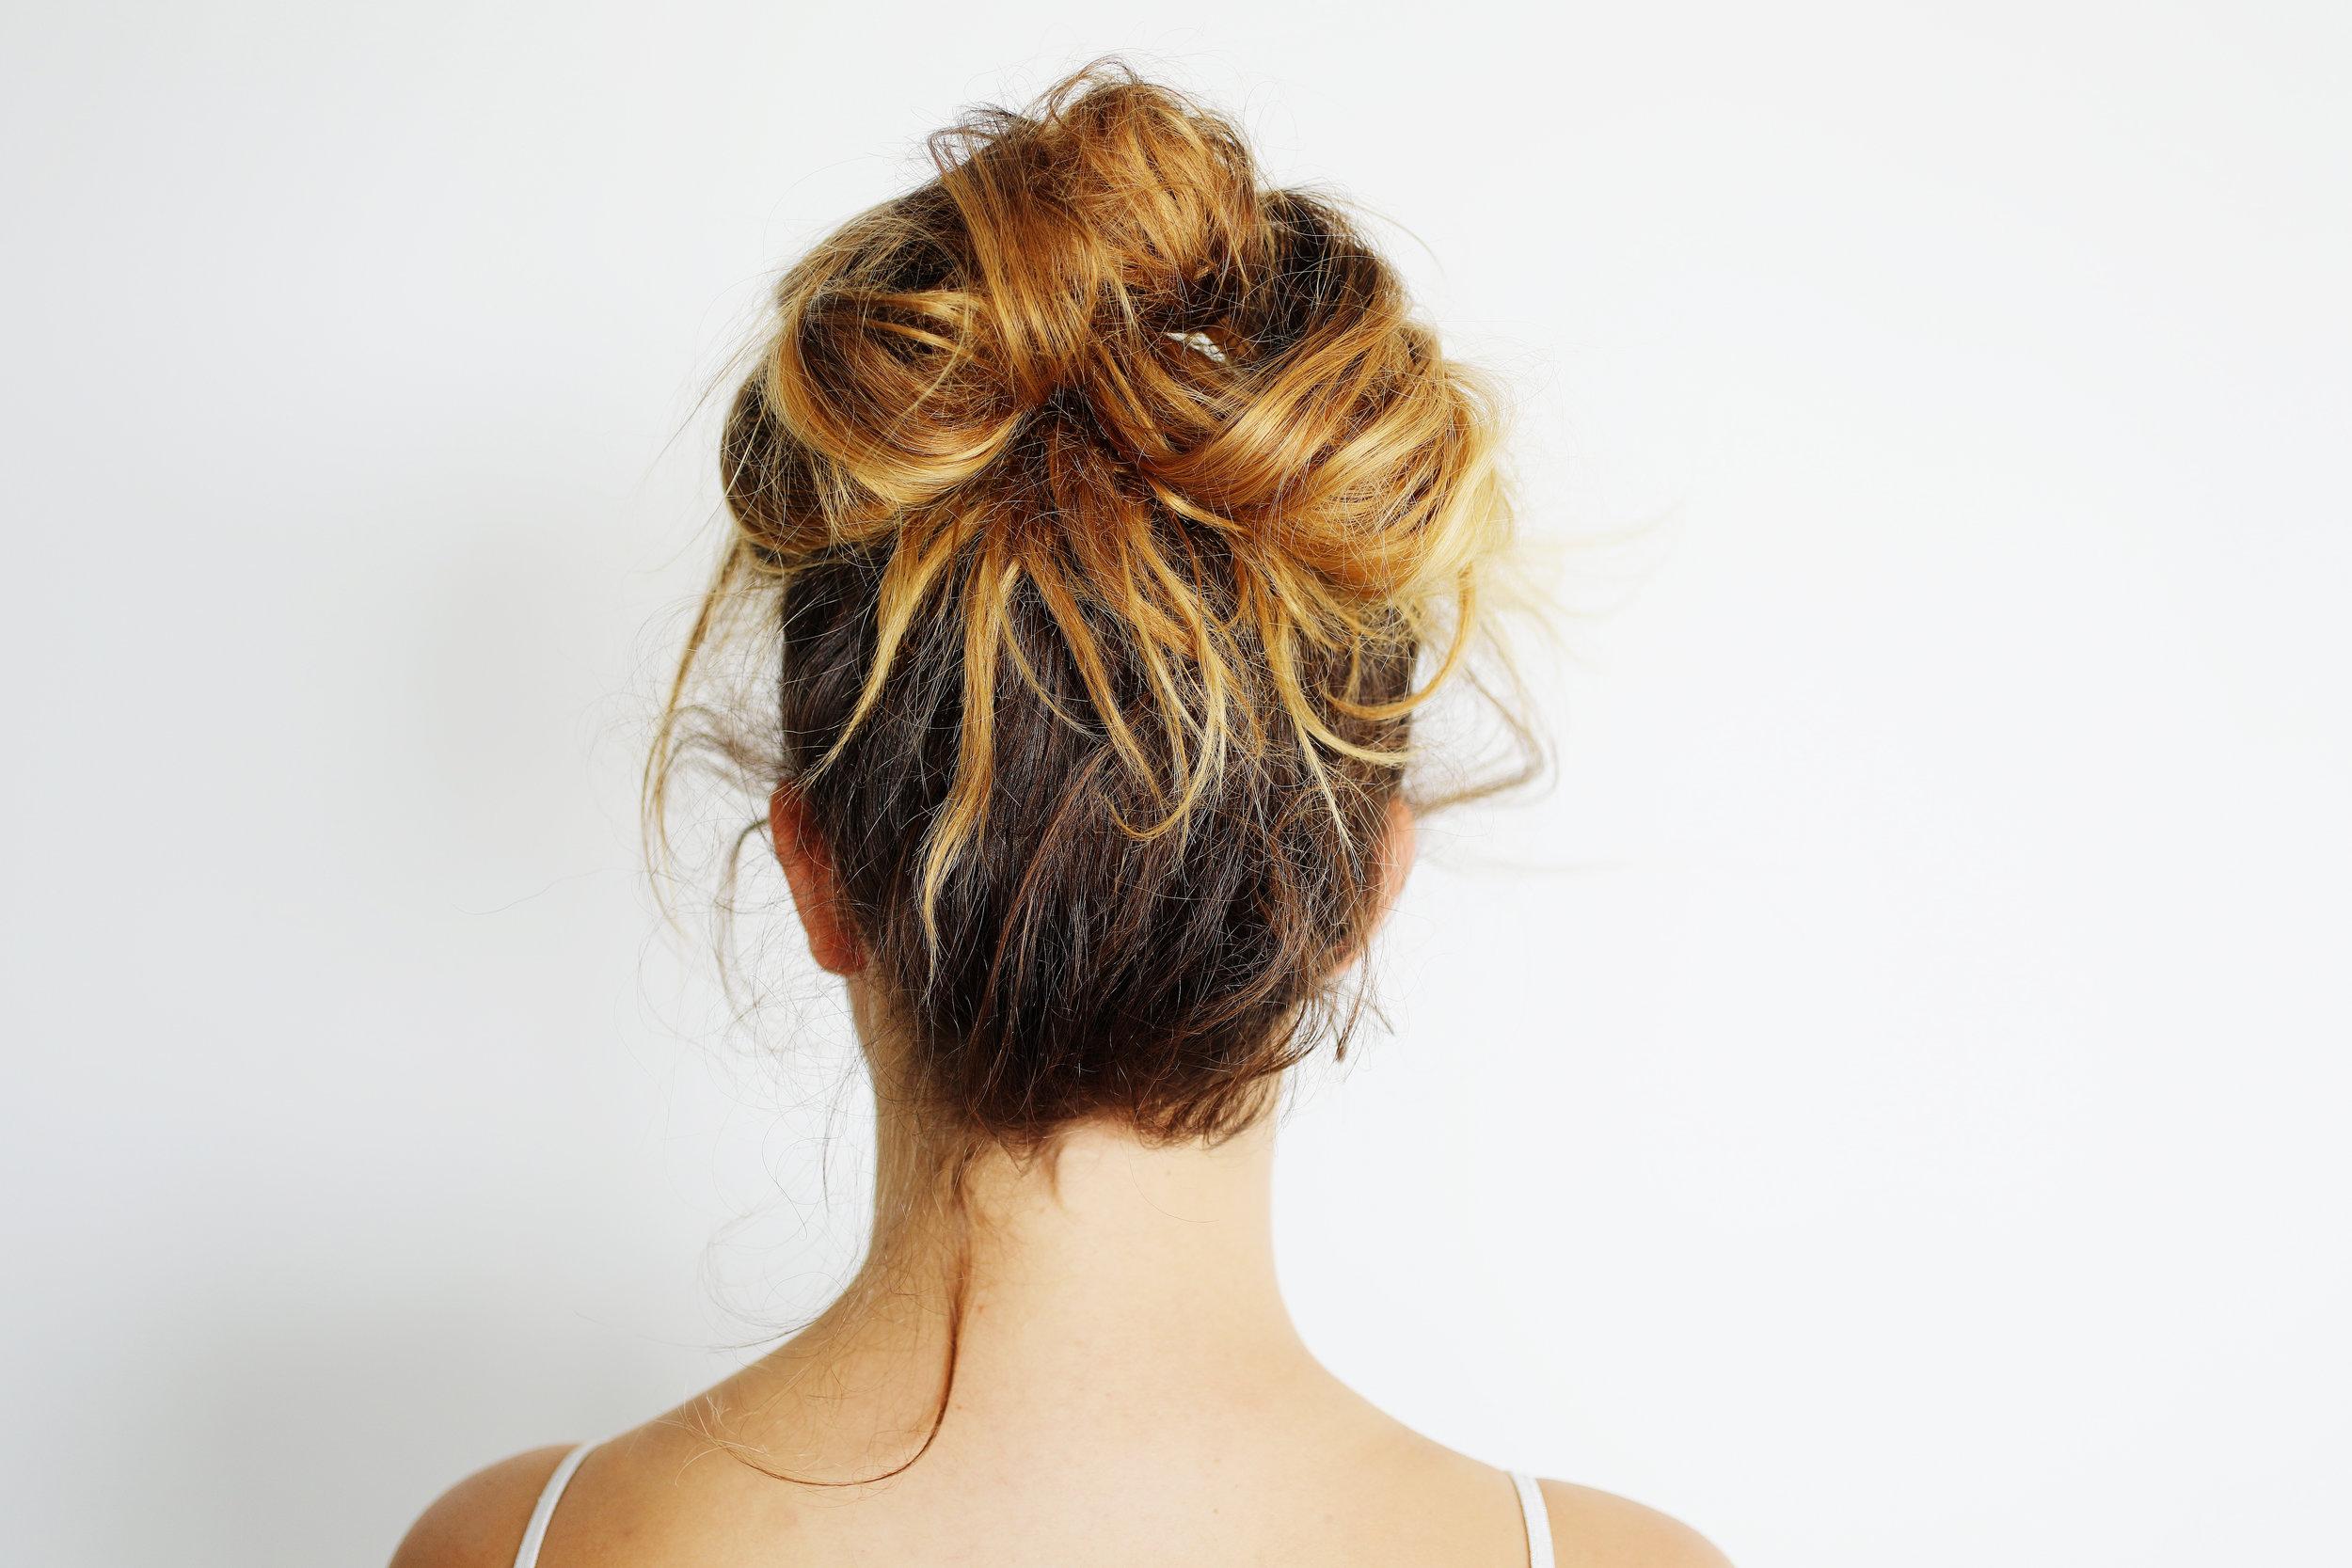 Messy-hairstyle-bun-need-klipped.jpg